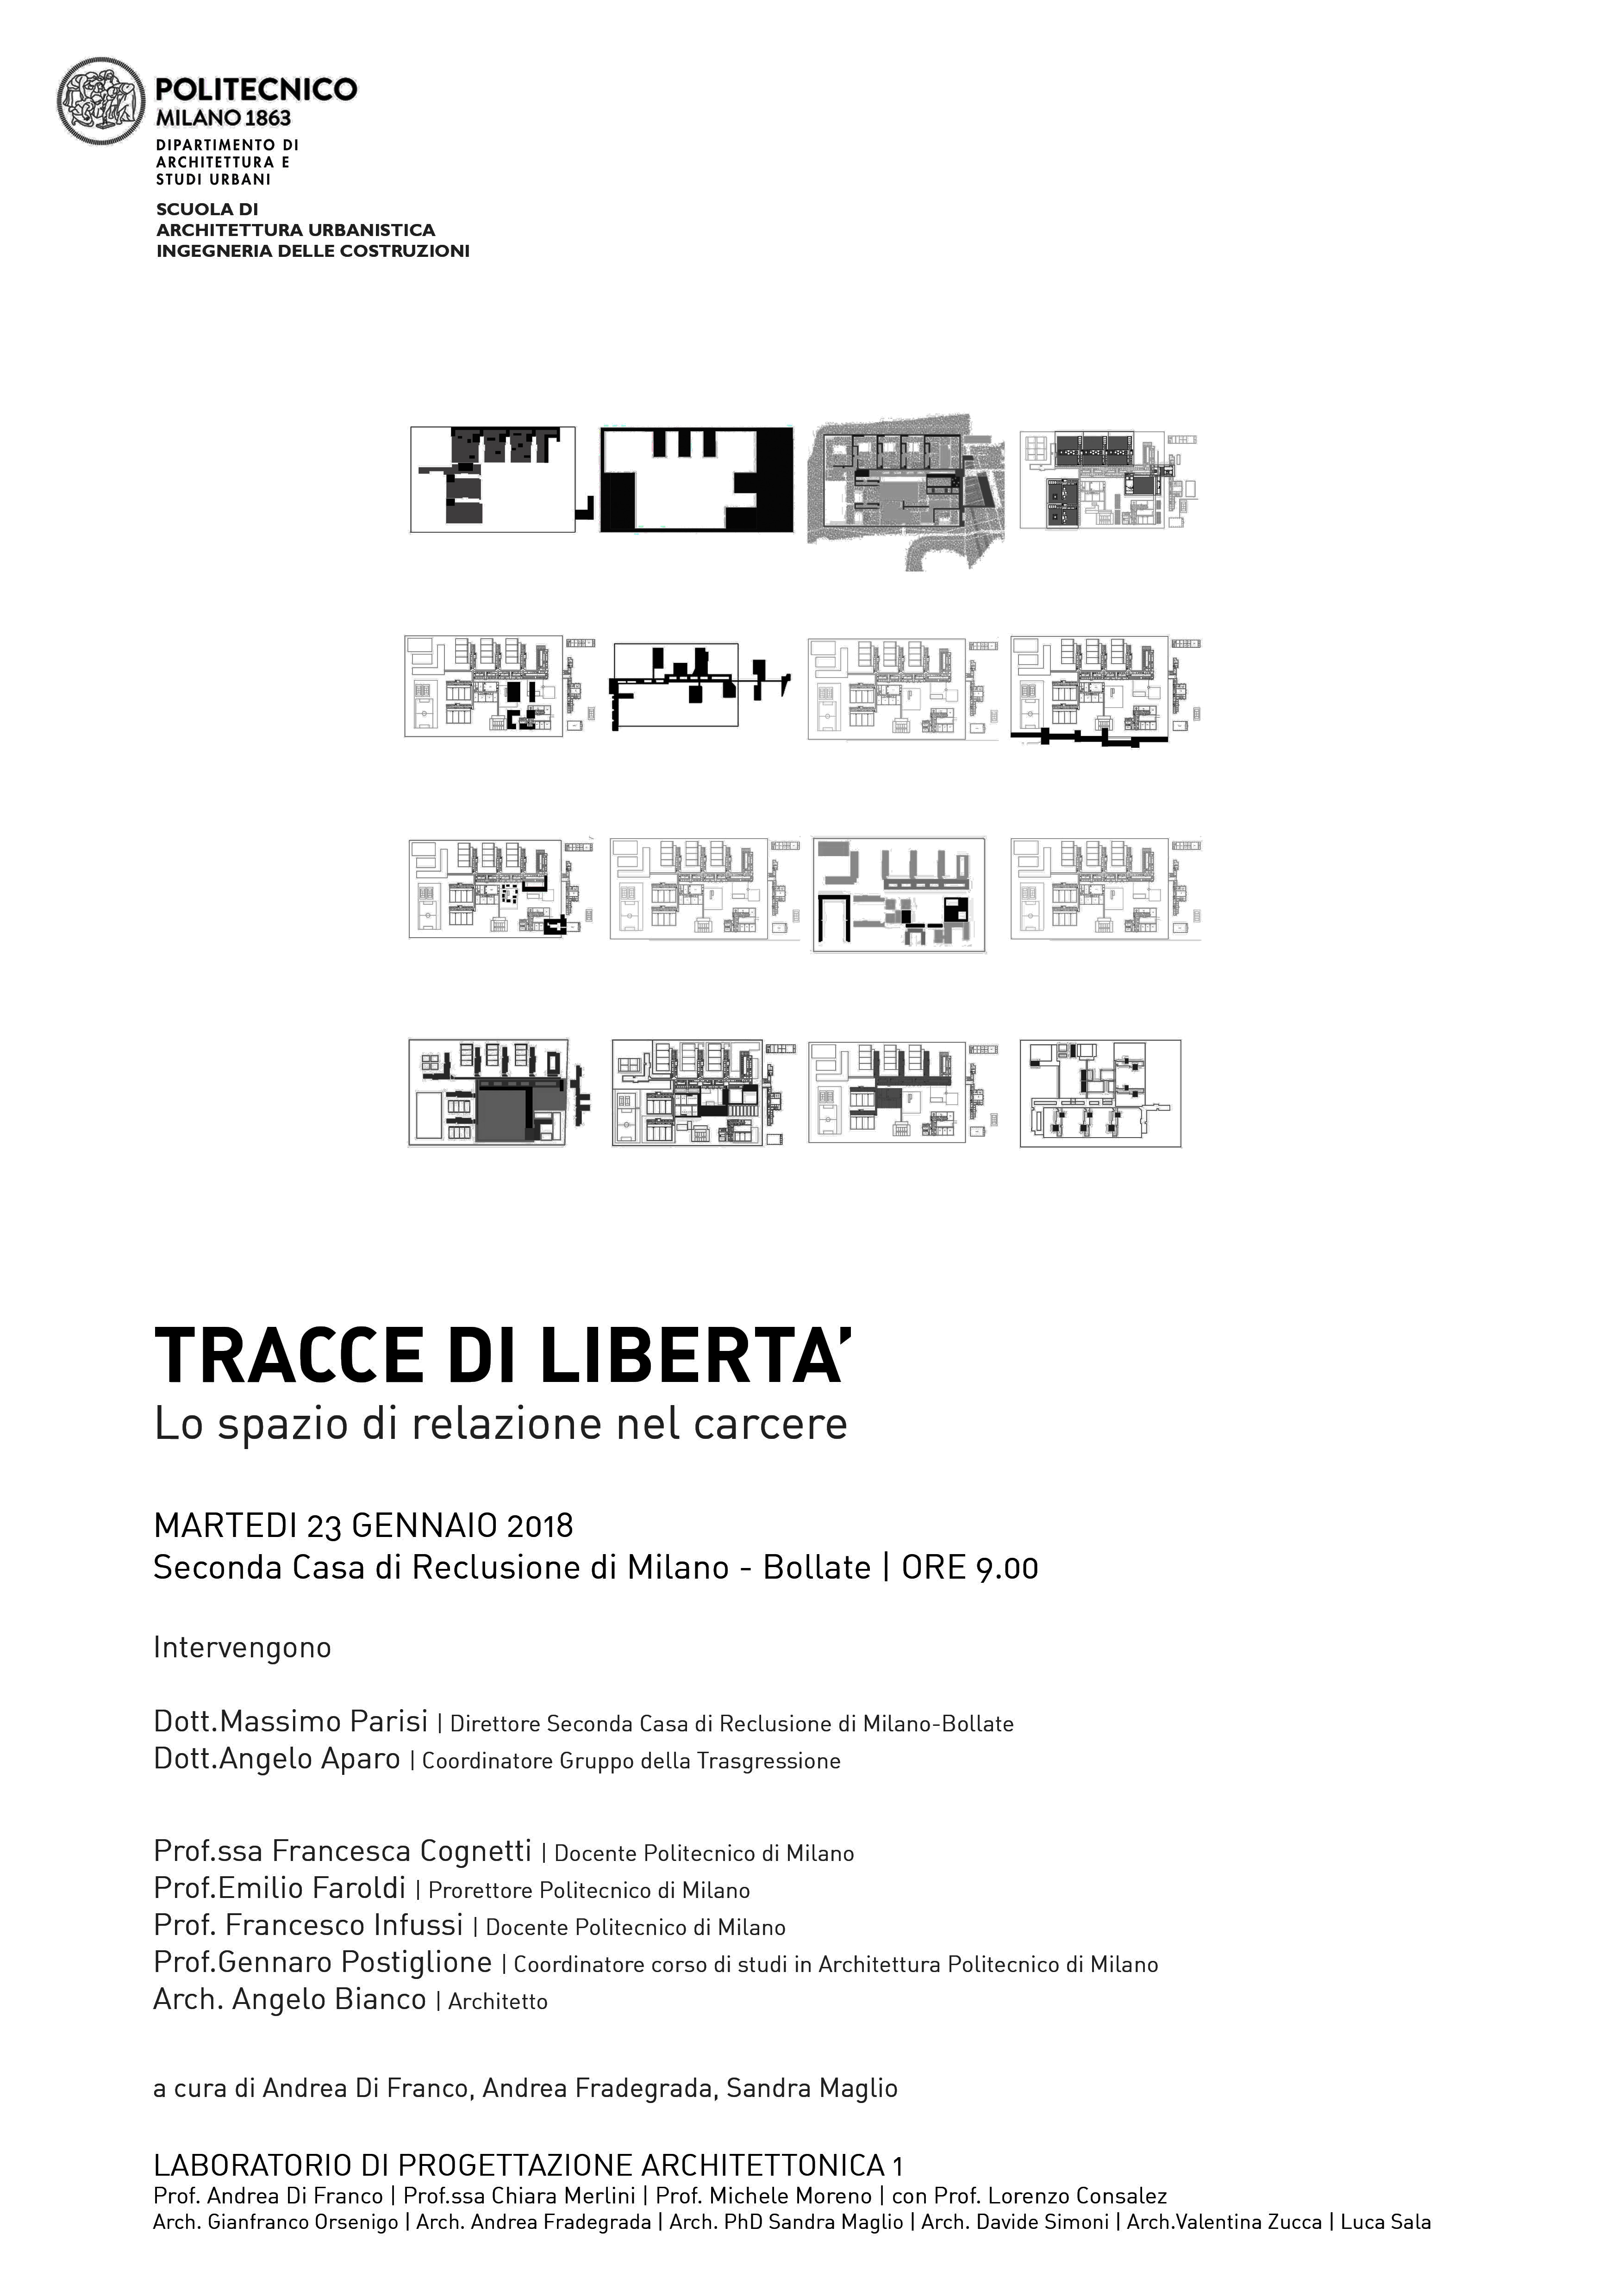 Politecnico Milano Calendario.Politecnico Milano Voci Dal Ponte